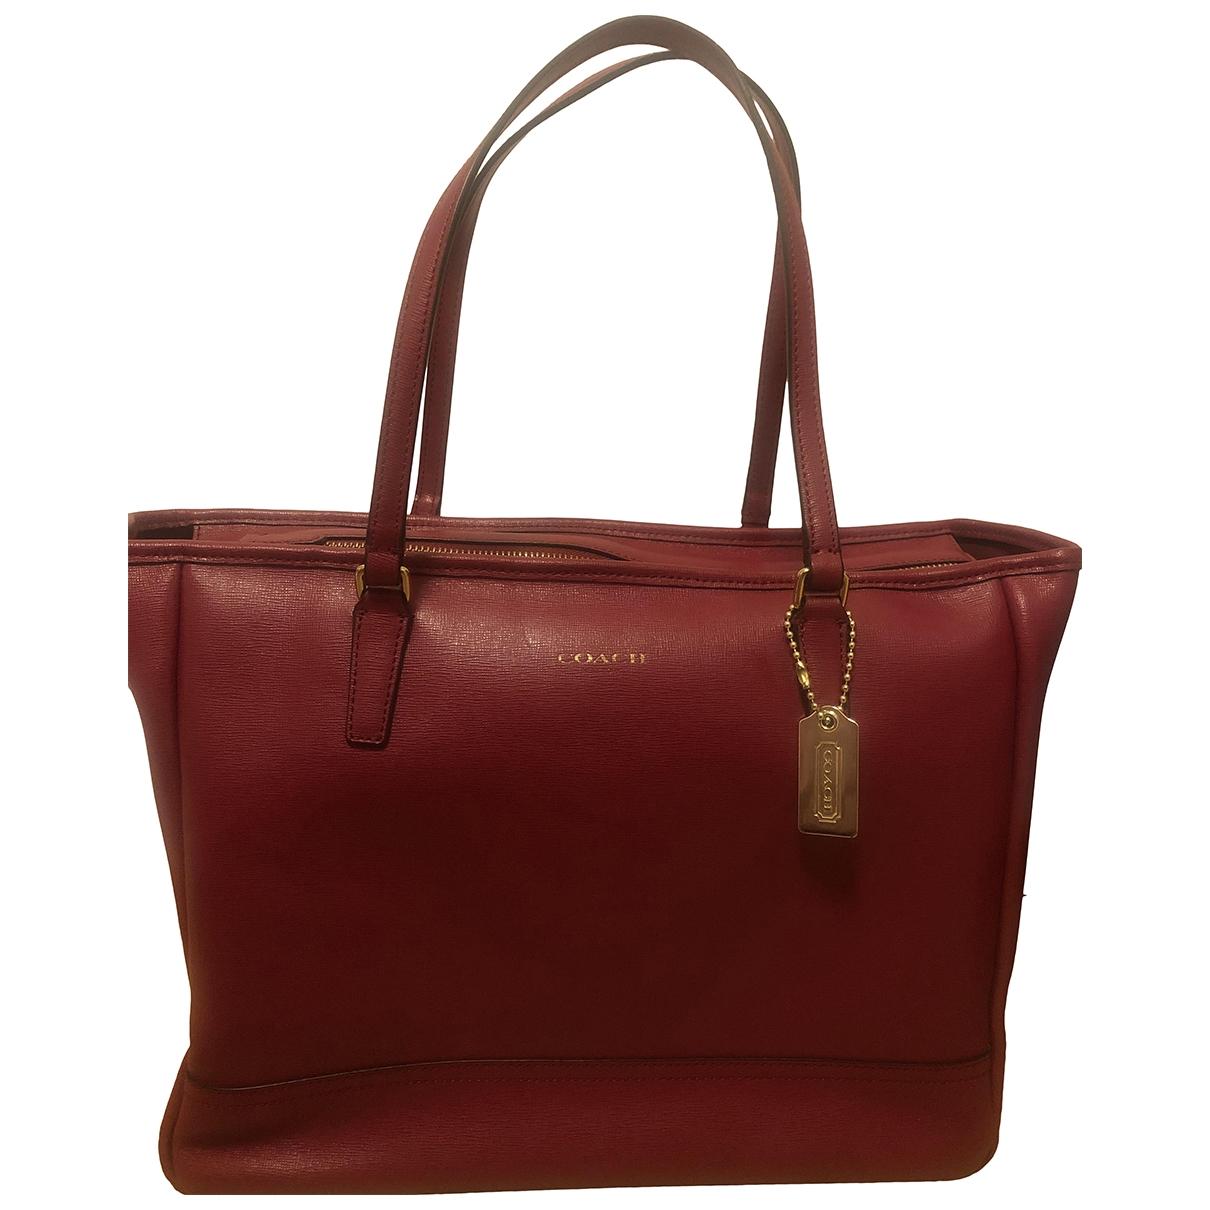 Coach \N Burgundy Leather handbag for Women \N